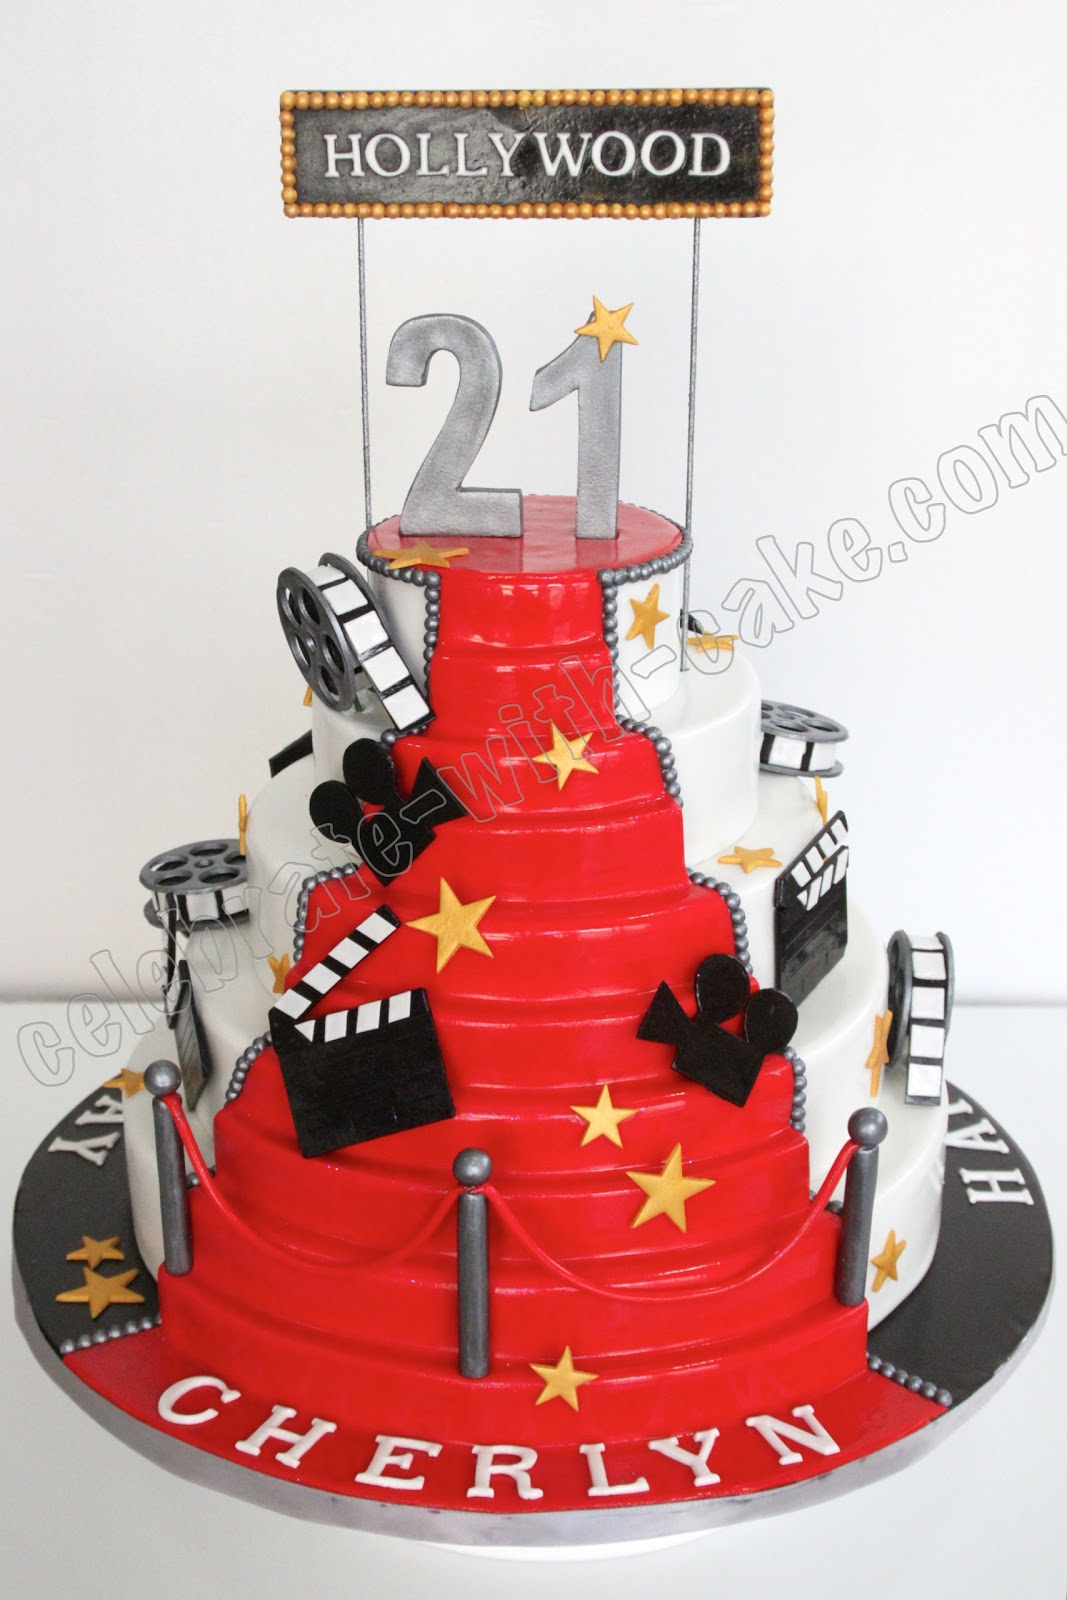 Astounding 13 Hollywood Birthday Cakes Photo Hollywood Themed Cake Funny Birthday Cards Online Alyptdamsfinfo